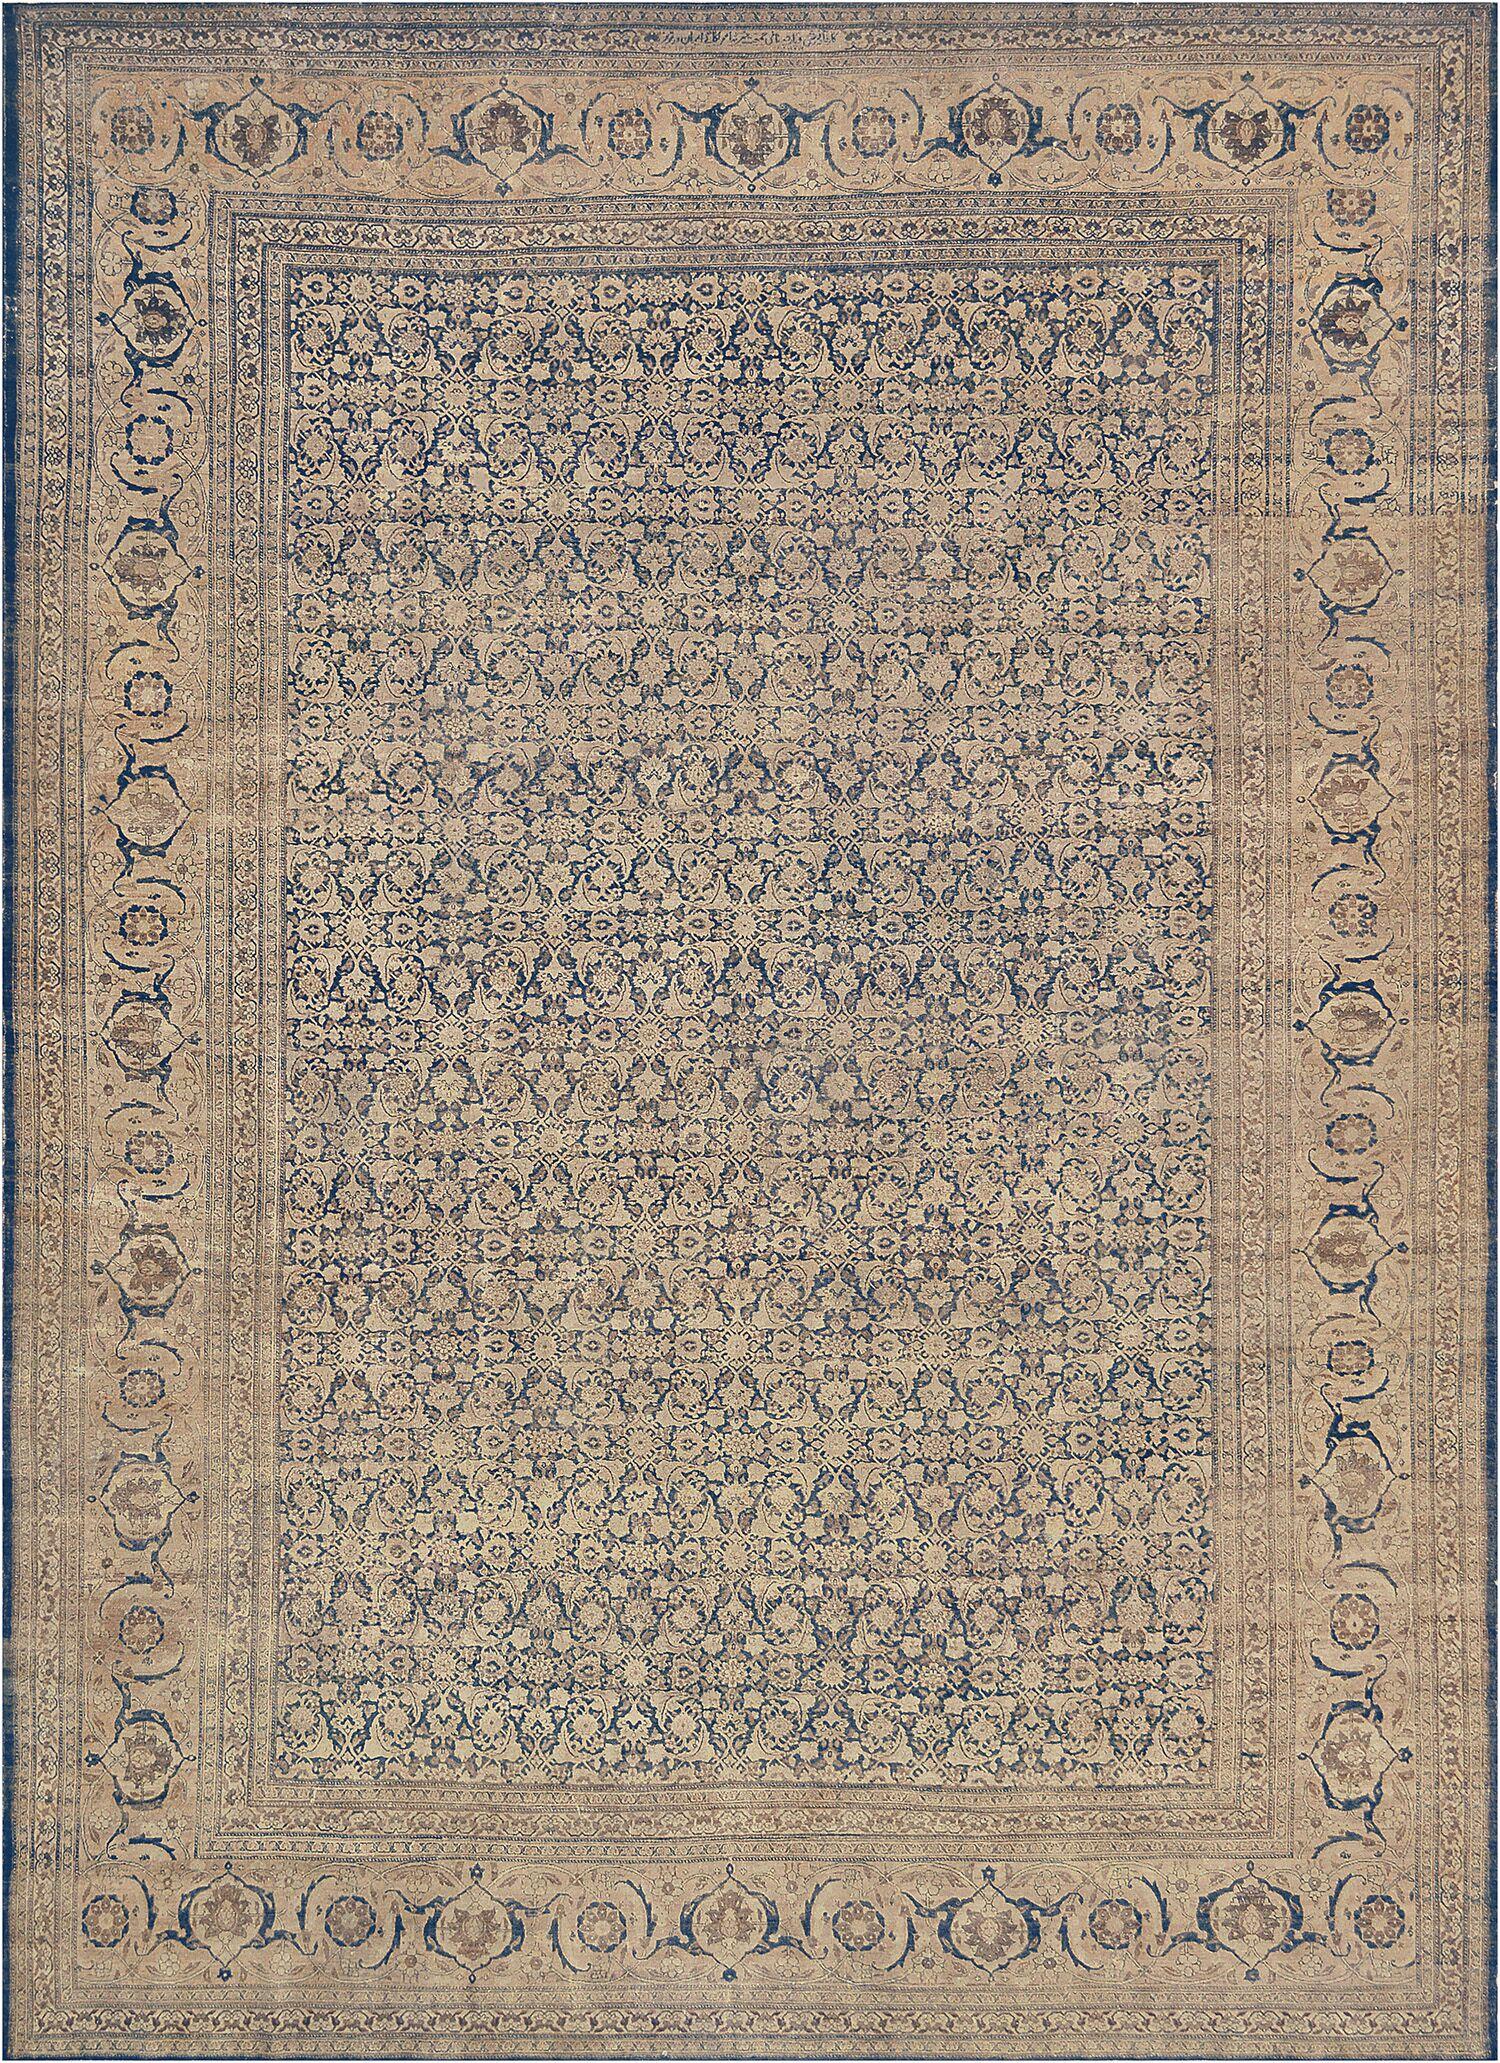 One-of-a-Kind Antique Tabriz Handwoven Wool Indigo Indoor Area Rug